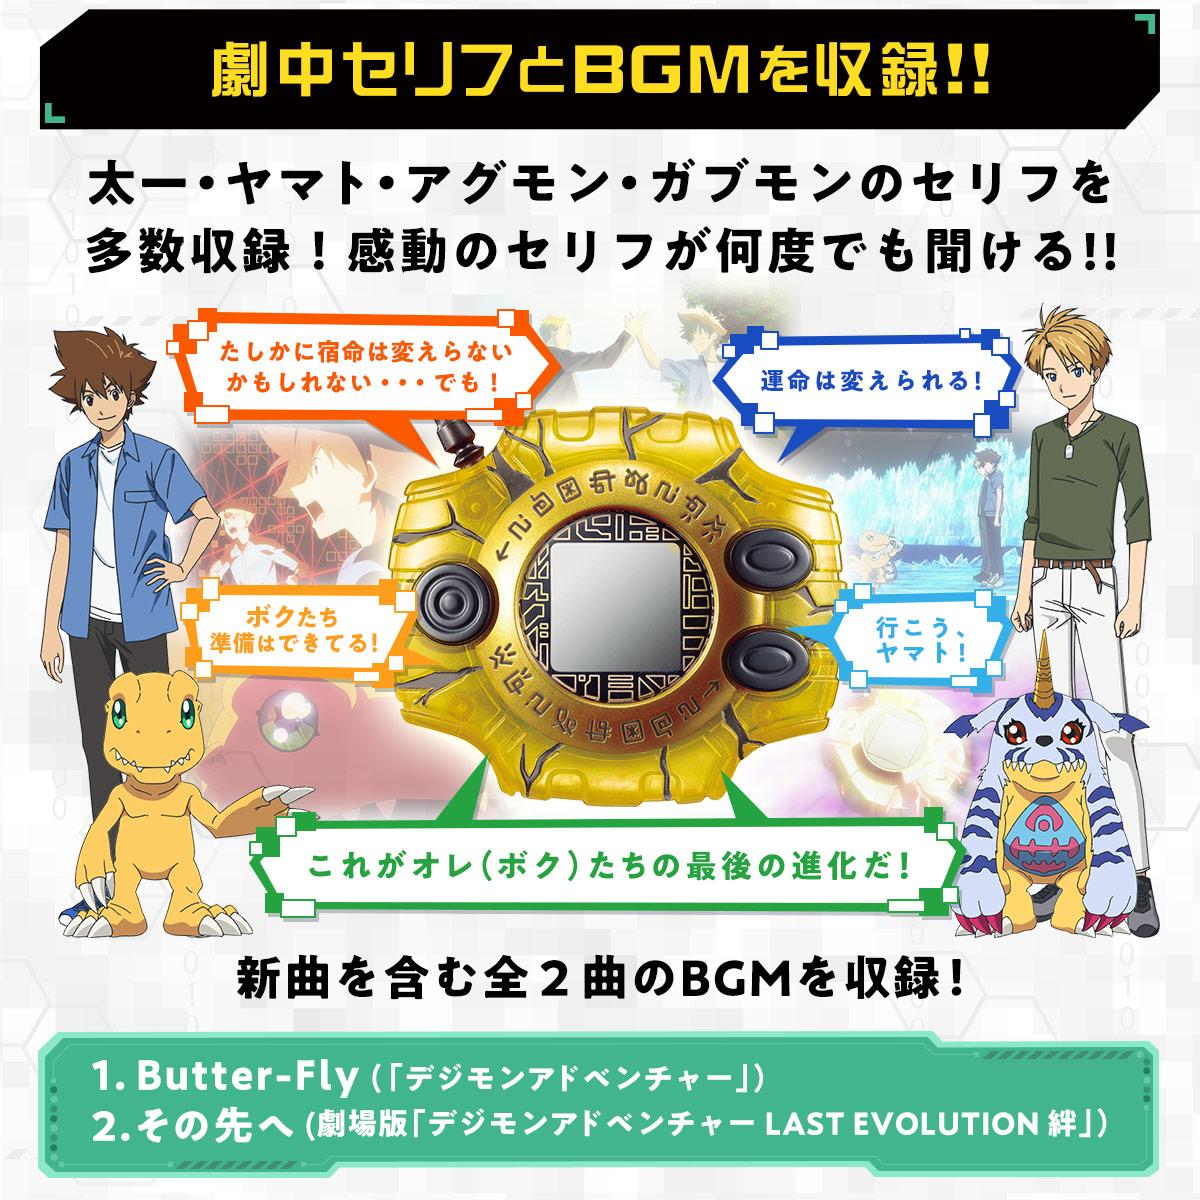 Digimon Card Premium Edition Digimon Adventure LAST EVOLUTION Kizuna 2 PSL